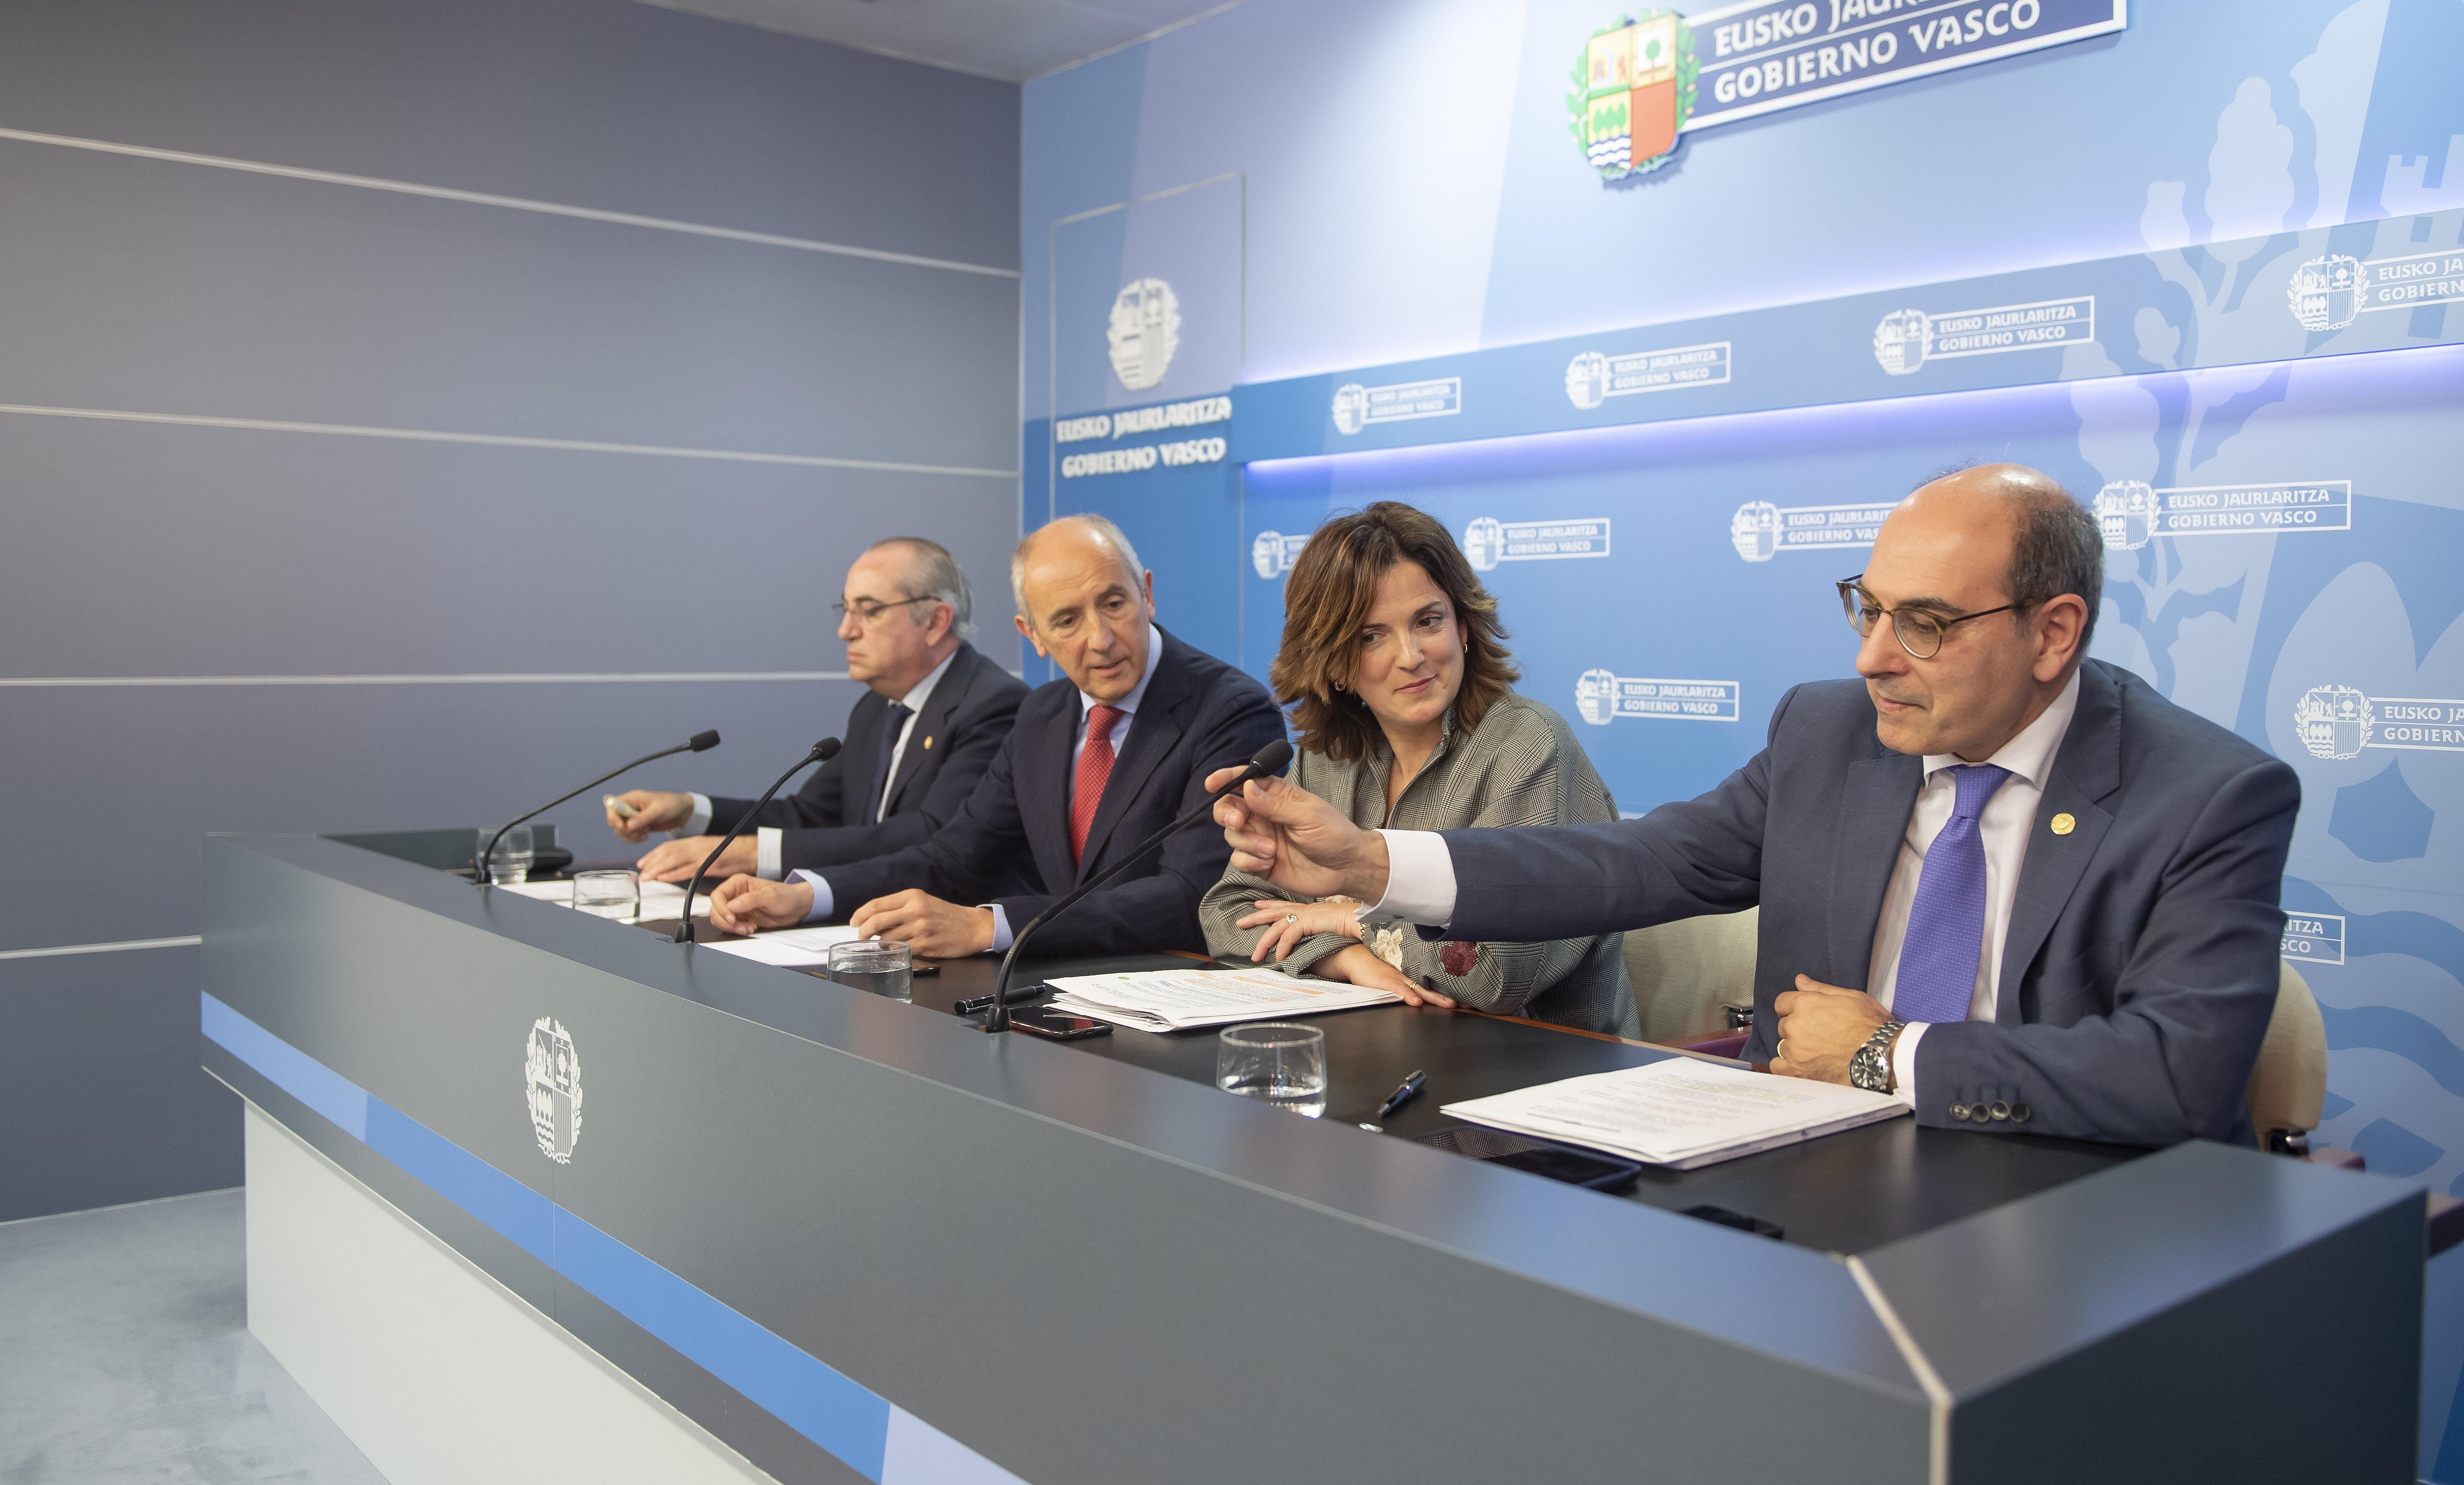 2019_02_26_consejo_gobierno_03.jpg